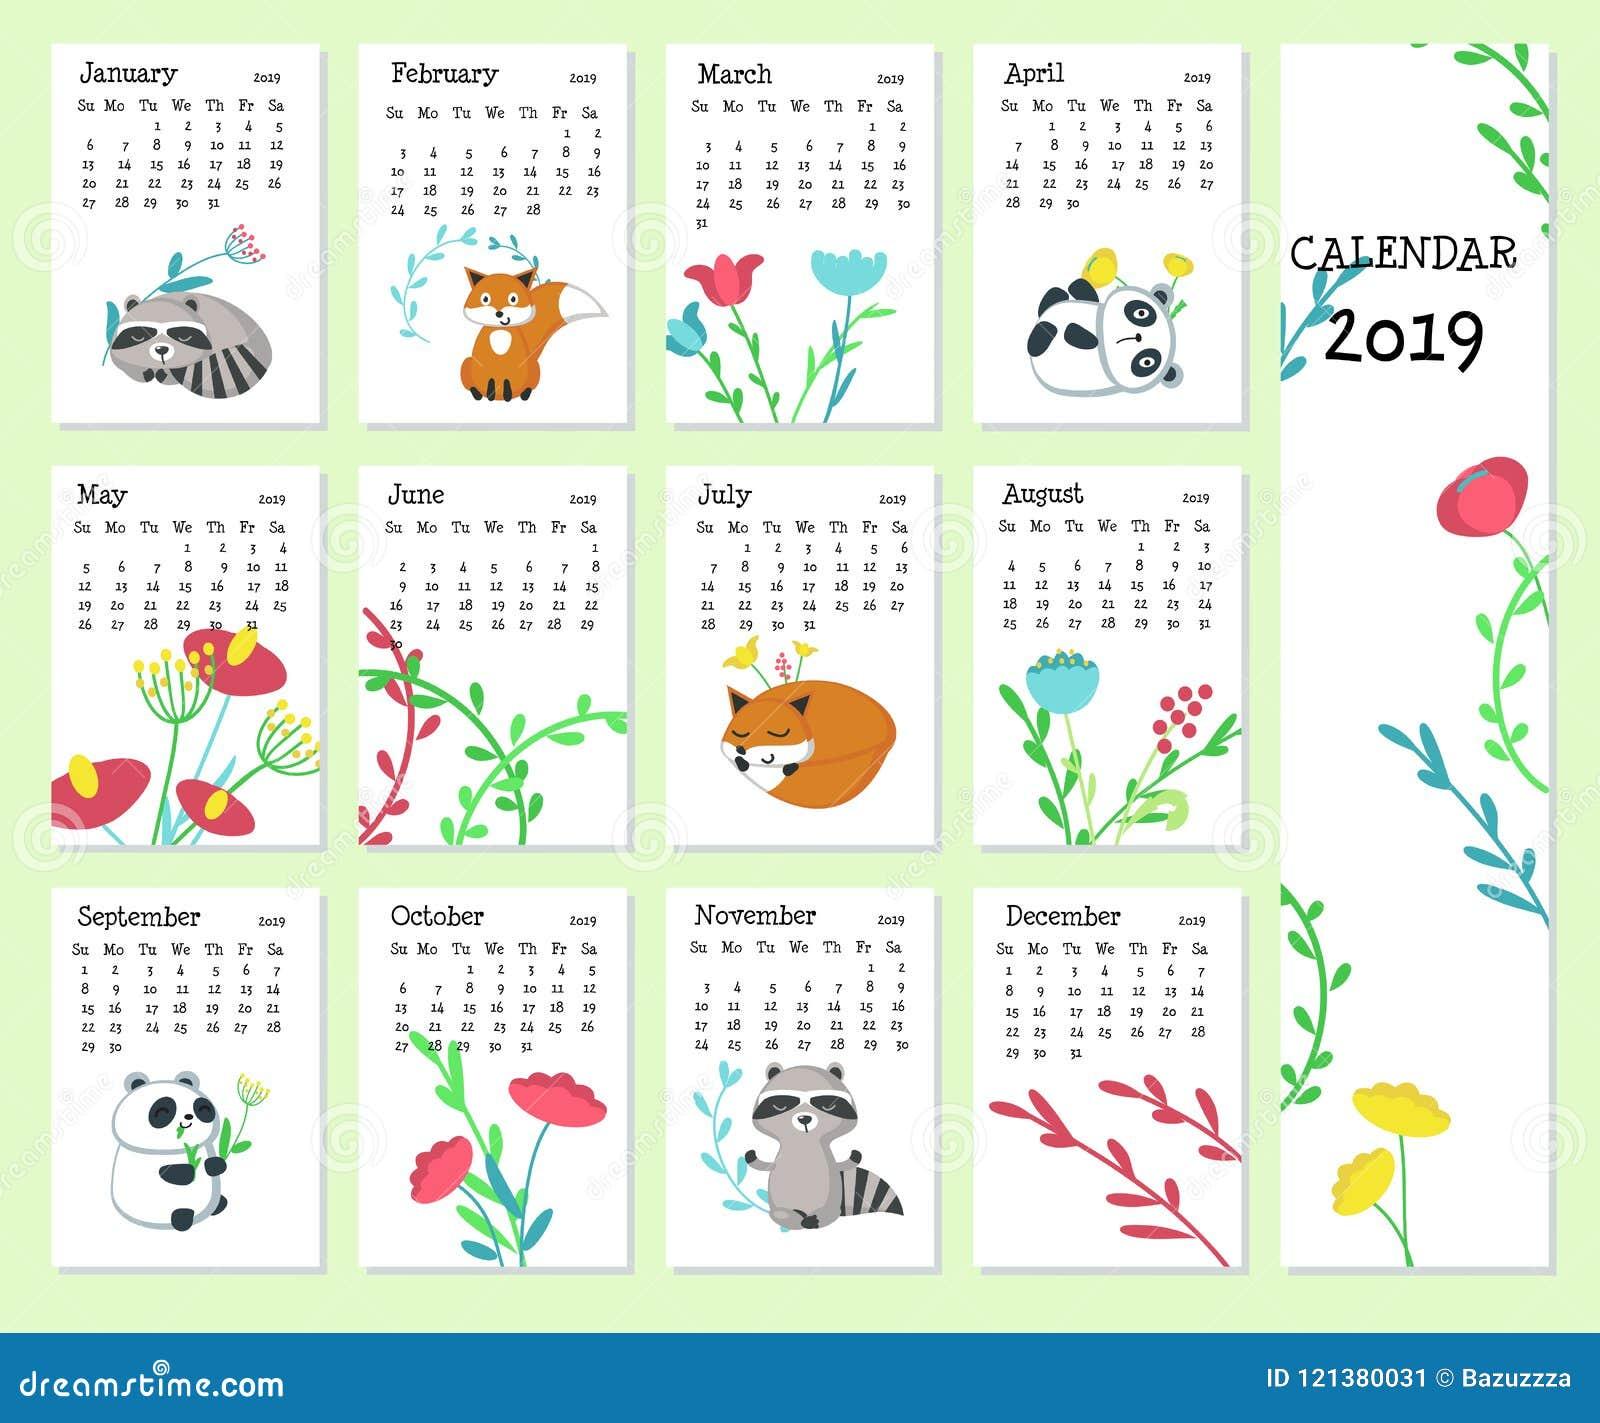 Calendar 2019 Vector Template With Cute Animals Stock Vector